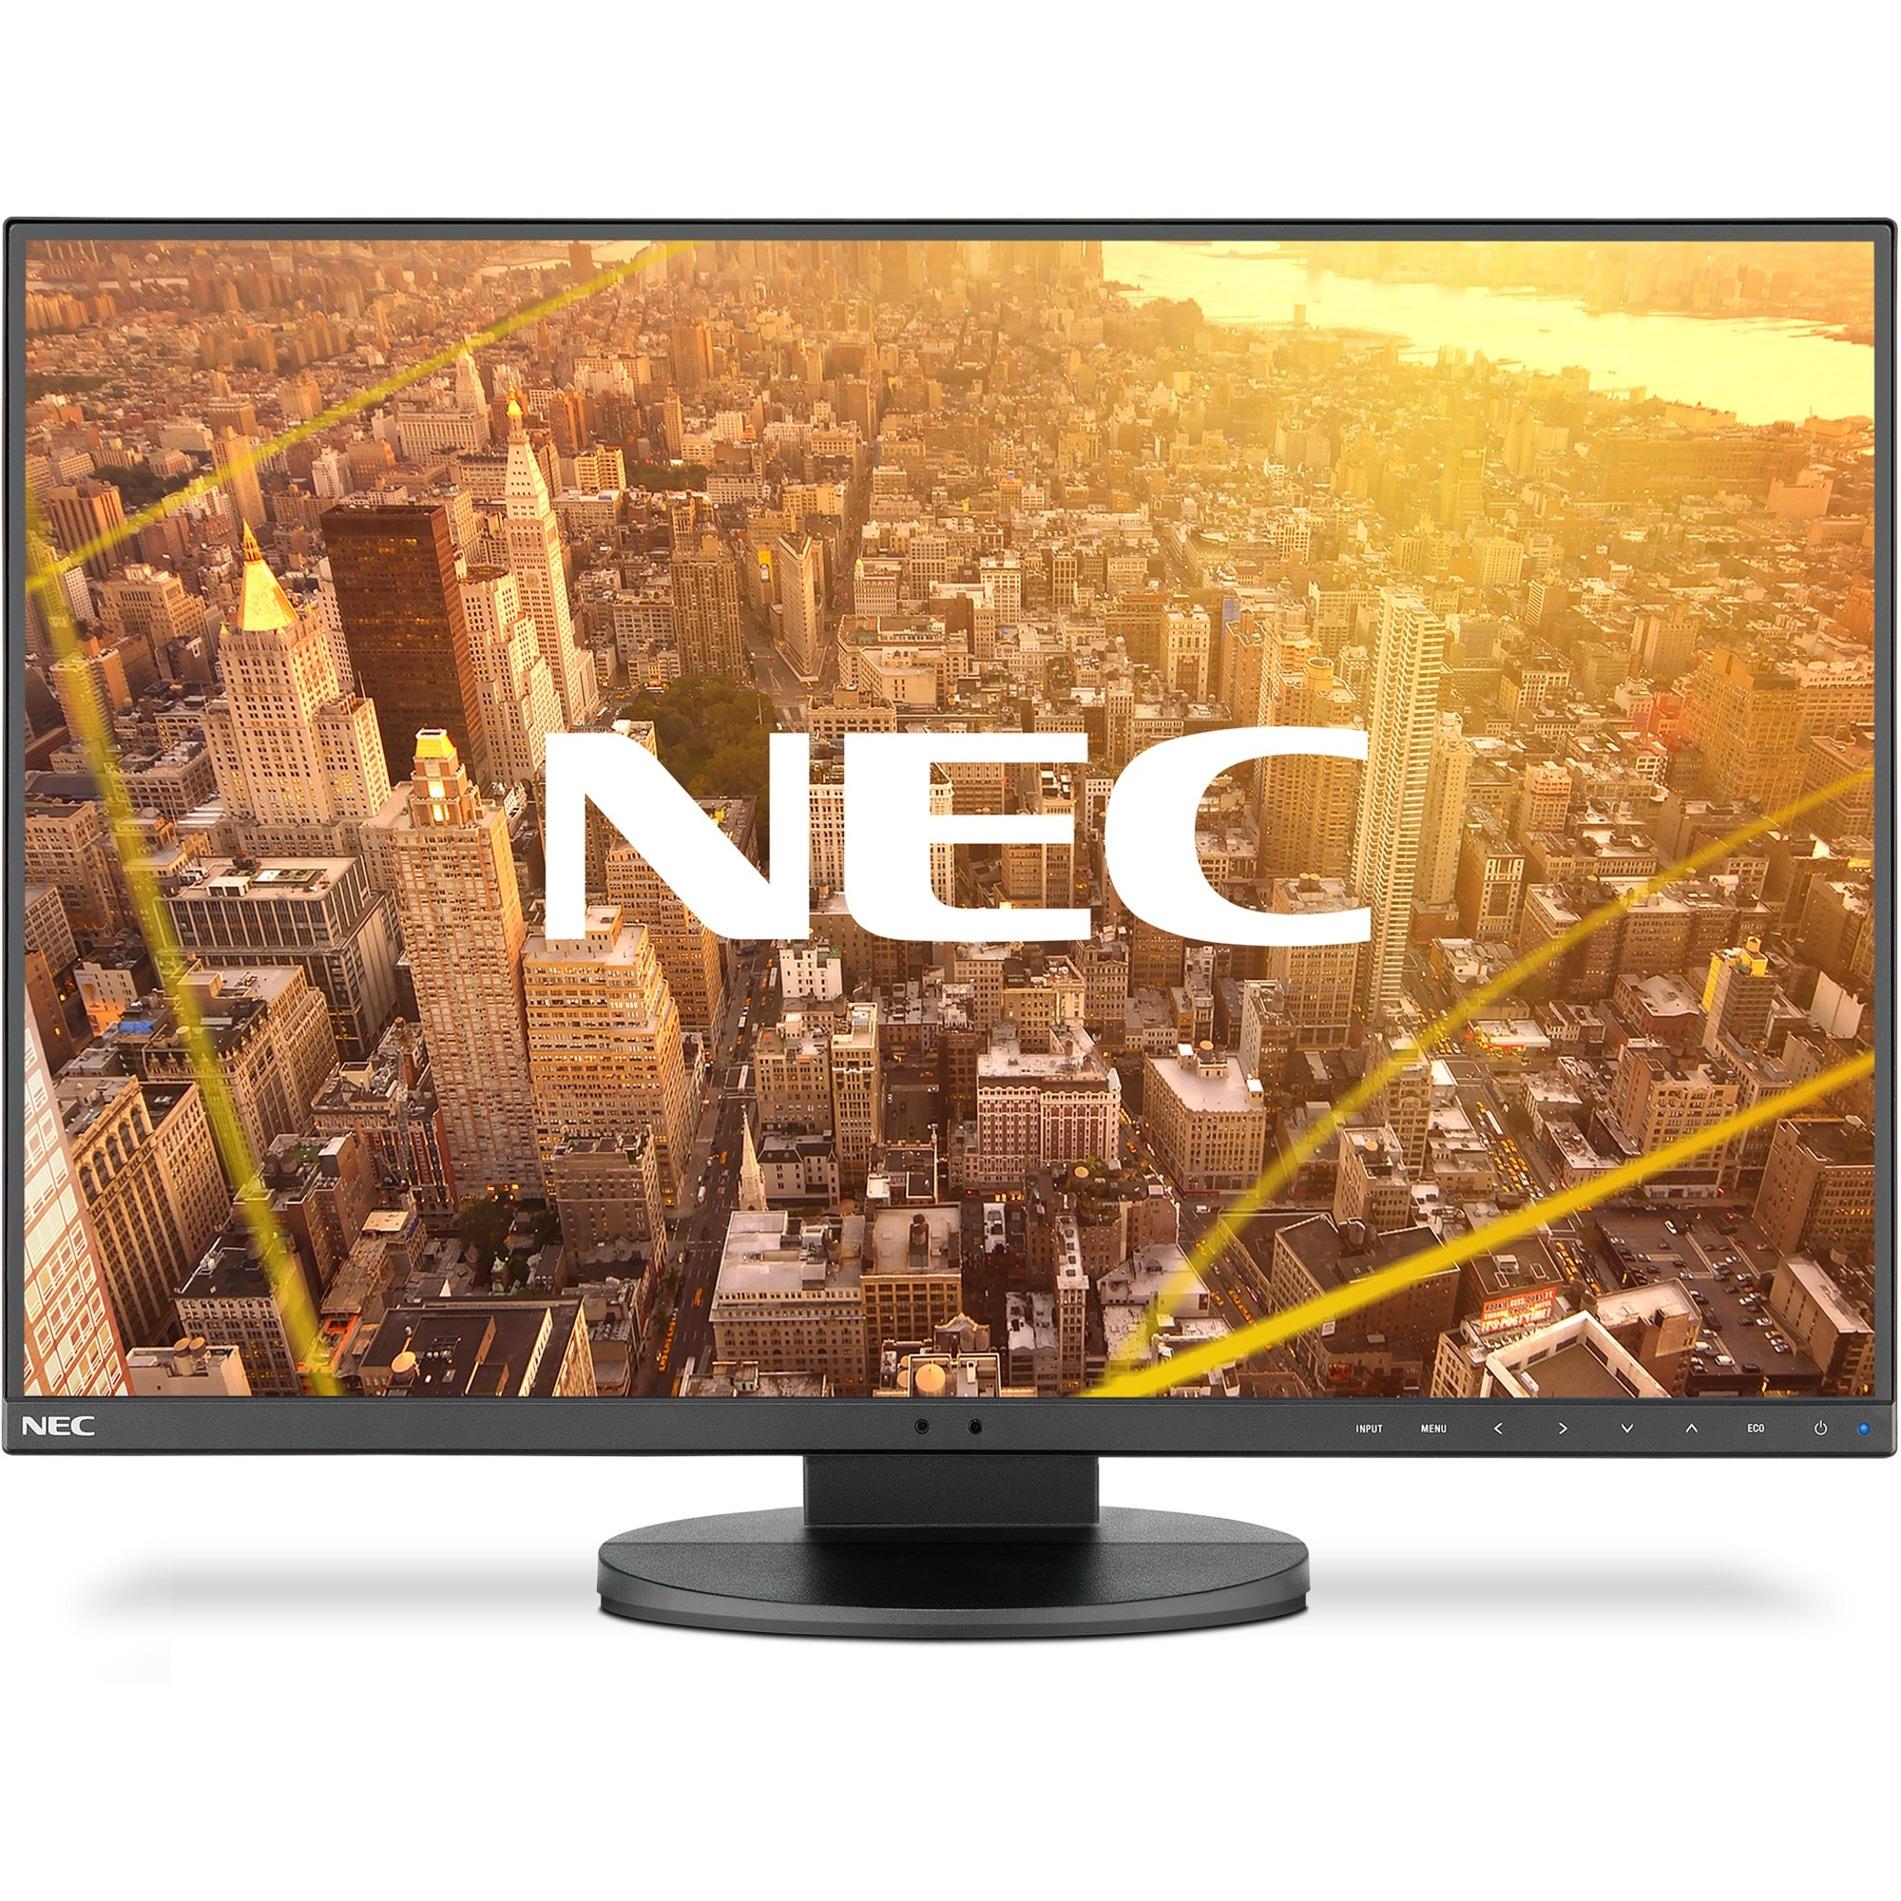 "MultiSync EA241WU pantalla para PC 61 cm (24"") WUXGA LCD Plana Negro, Monitor LED"